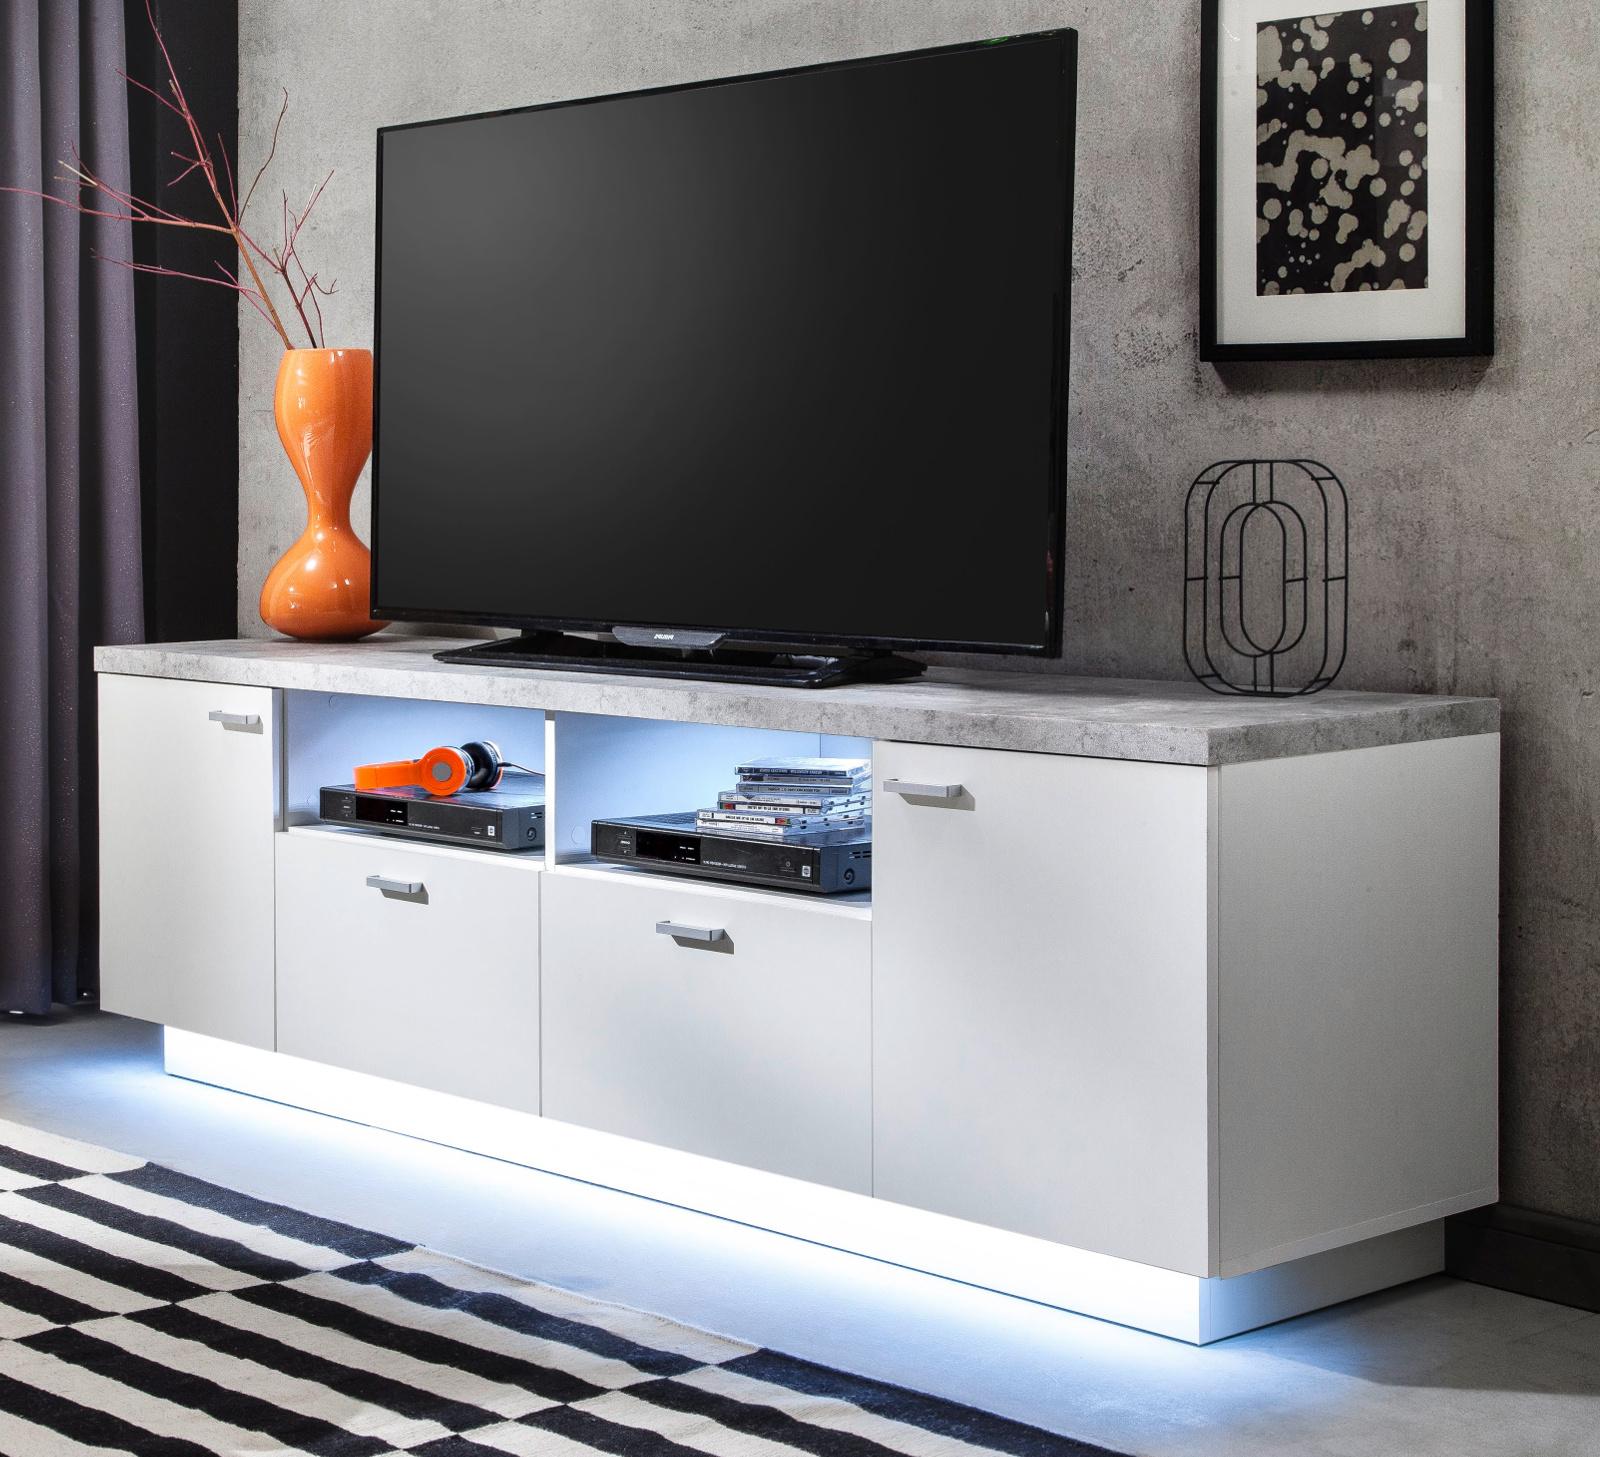 ikea hochbett vradal mit rutsche. Black Bedroom Furniture Sets. Home Design Ideas